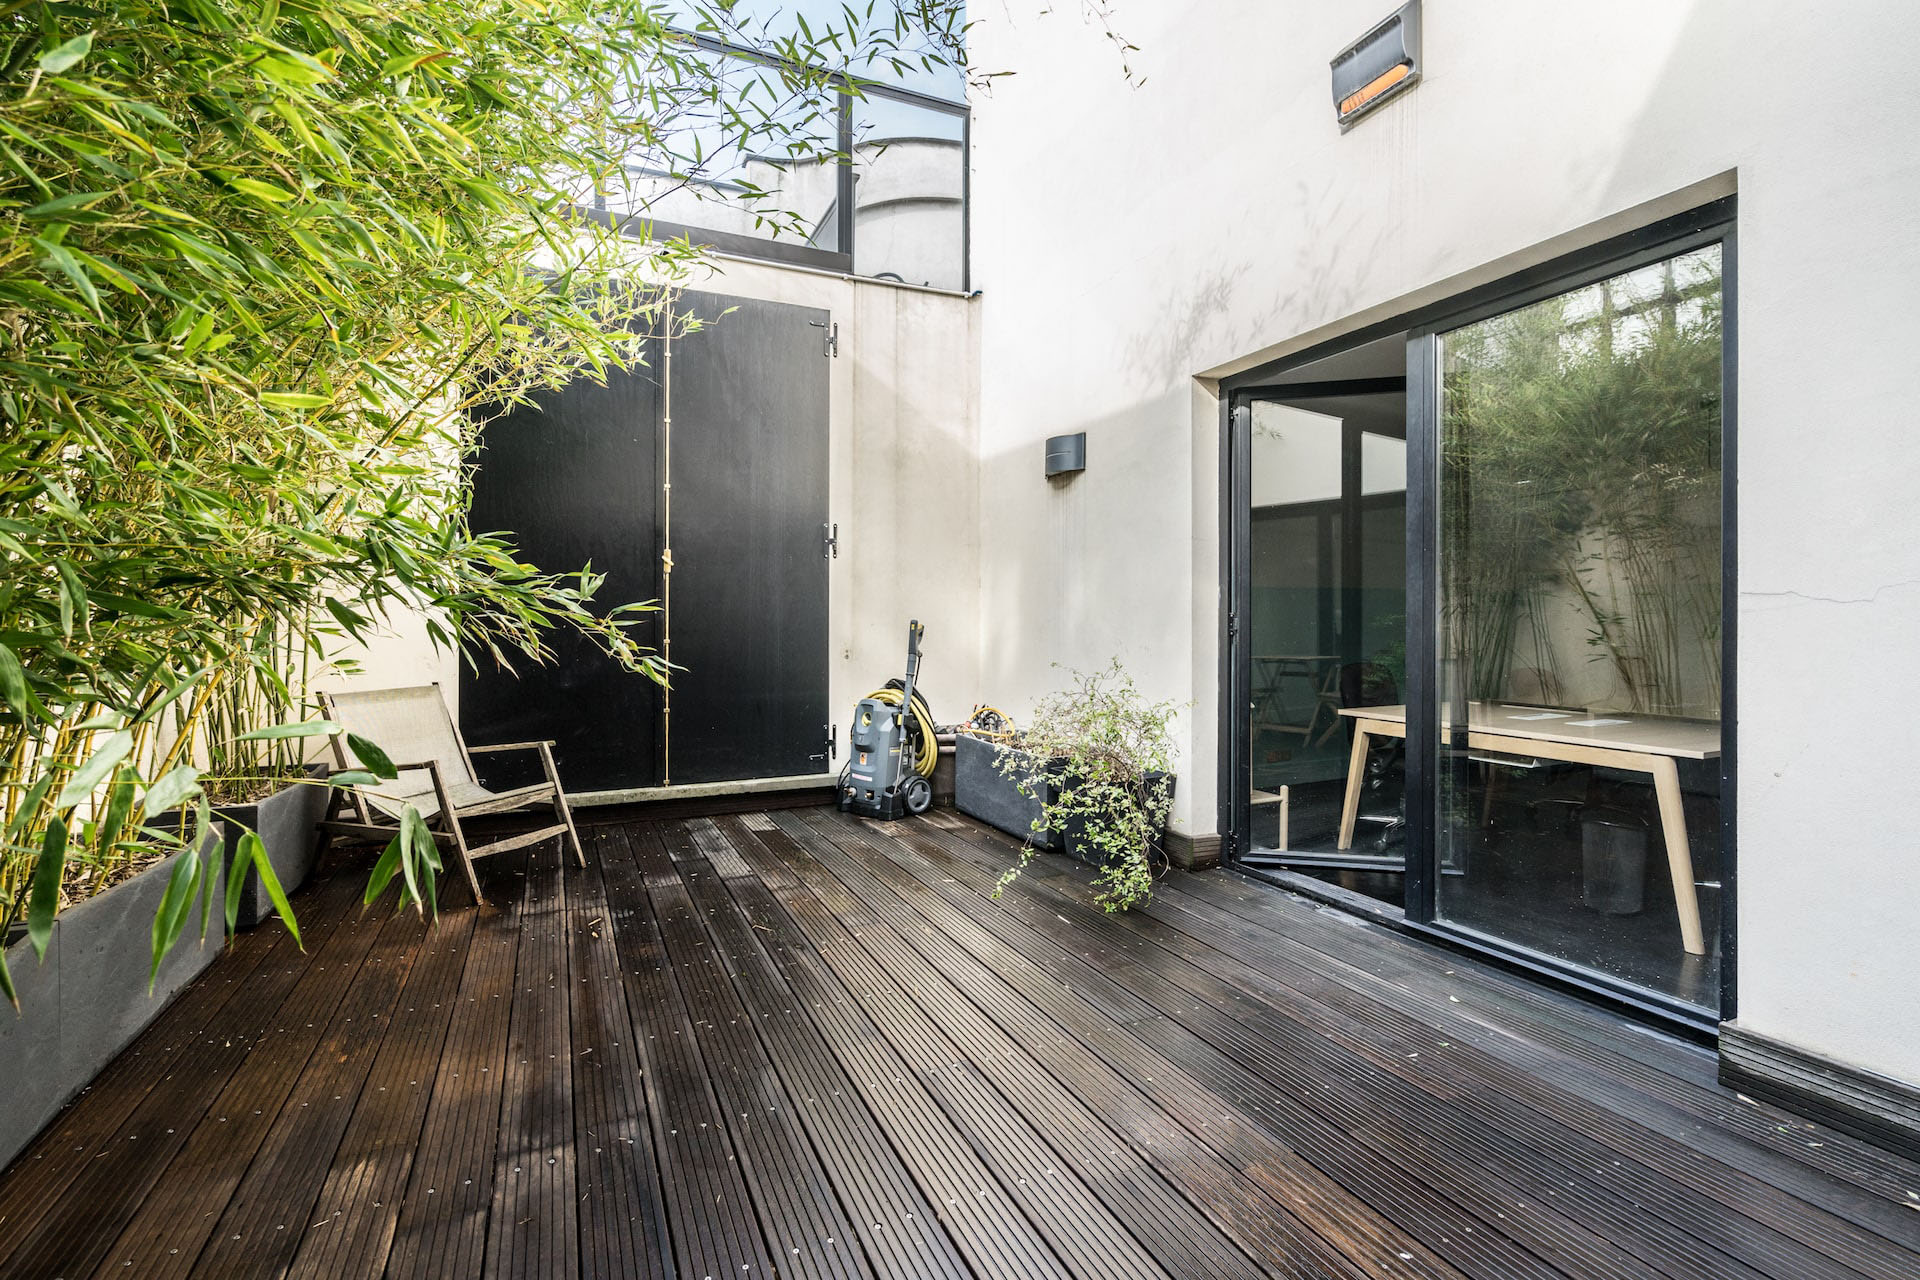 La Piscine Coworking - Pantin - Terrasse jardin intérieur